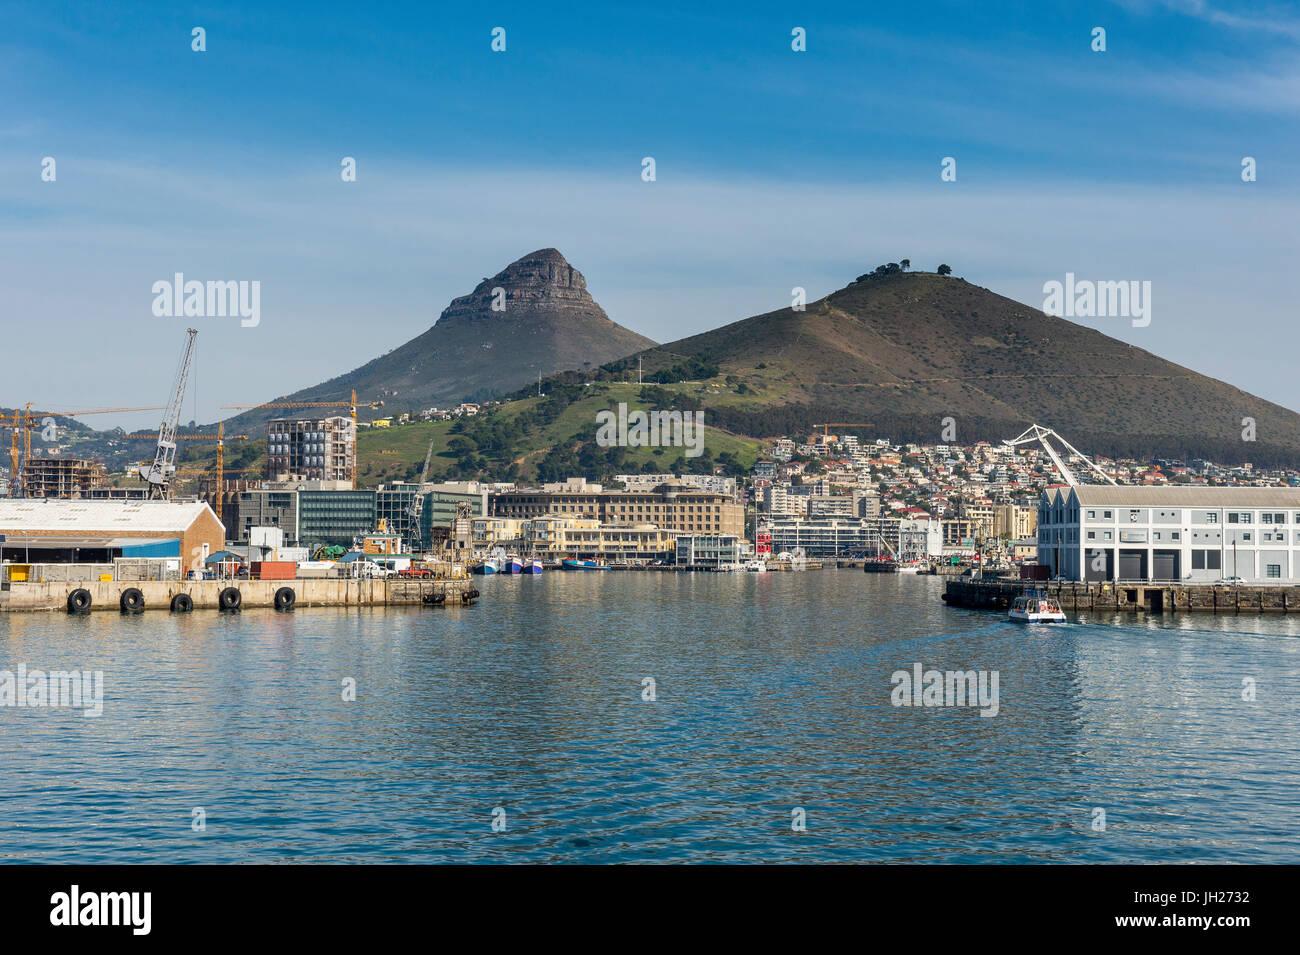 Horizonte de Cape Town con Lions Head en el fondo, Cape Town, Sudáfrica, África Imagen De Stock